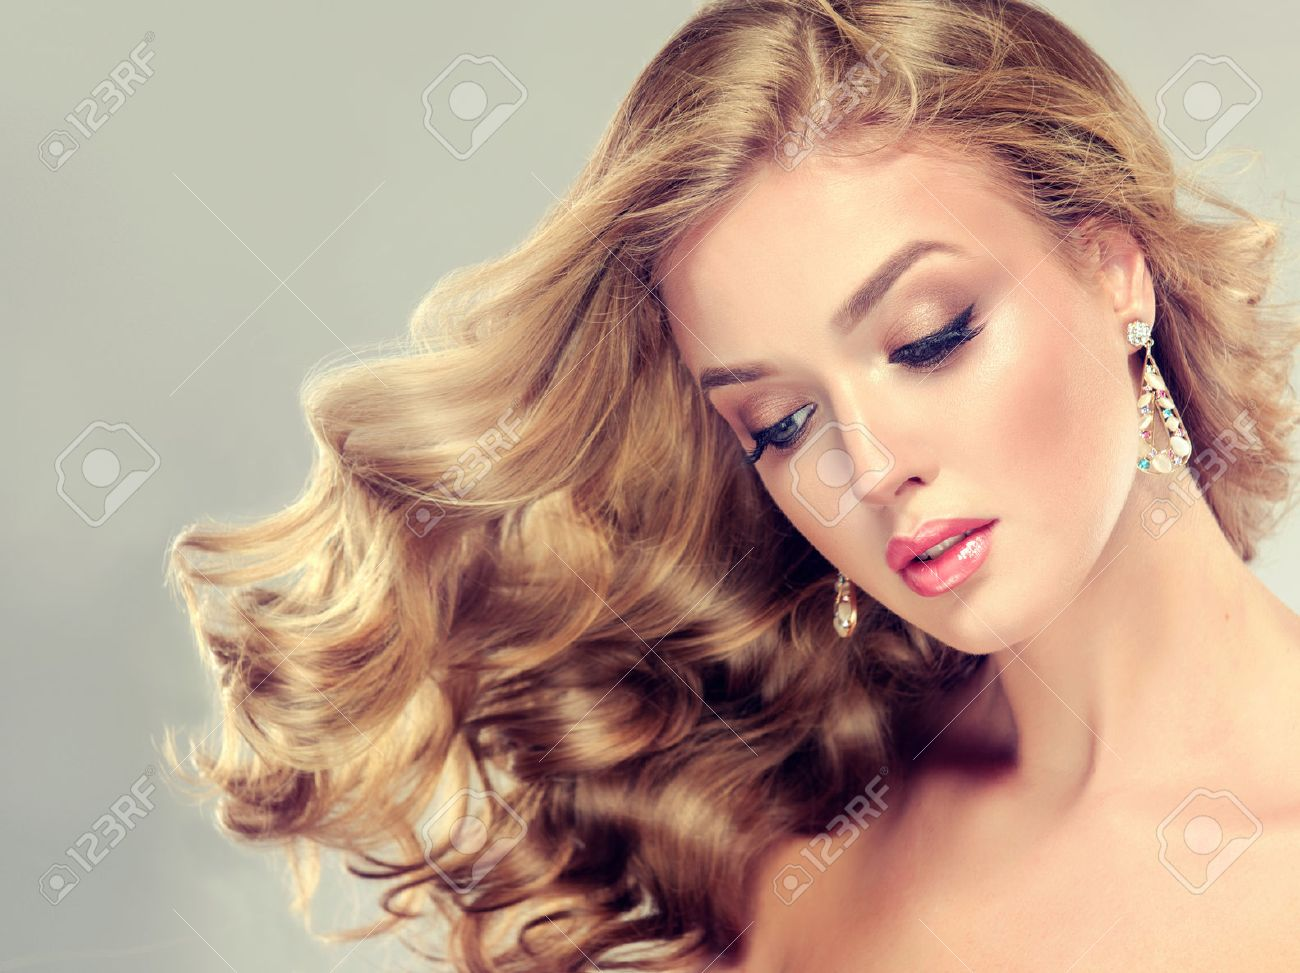 Beautiful Girl Blonde Hair With An Elegant Hairstyle Wavy Hair